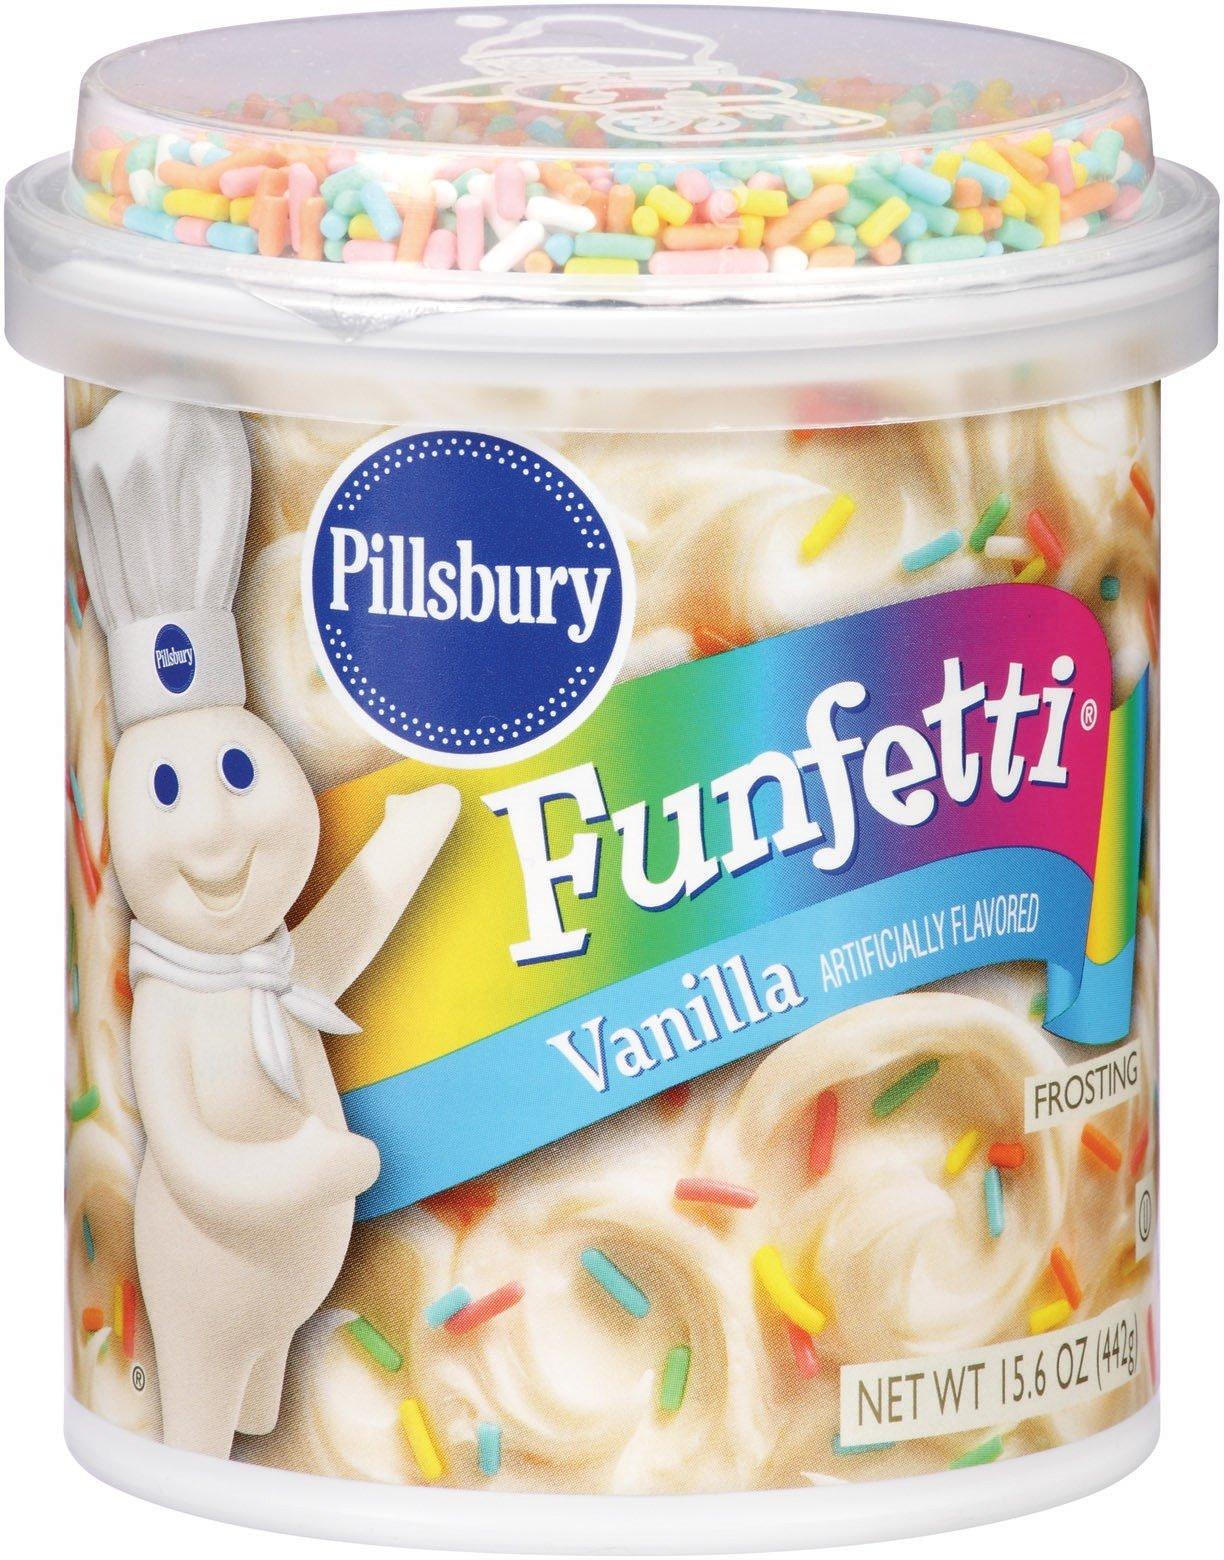 Pillsbury Frosting 15.6 OZ (Pack of 24)